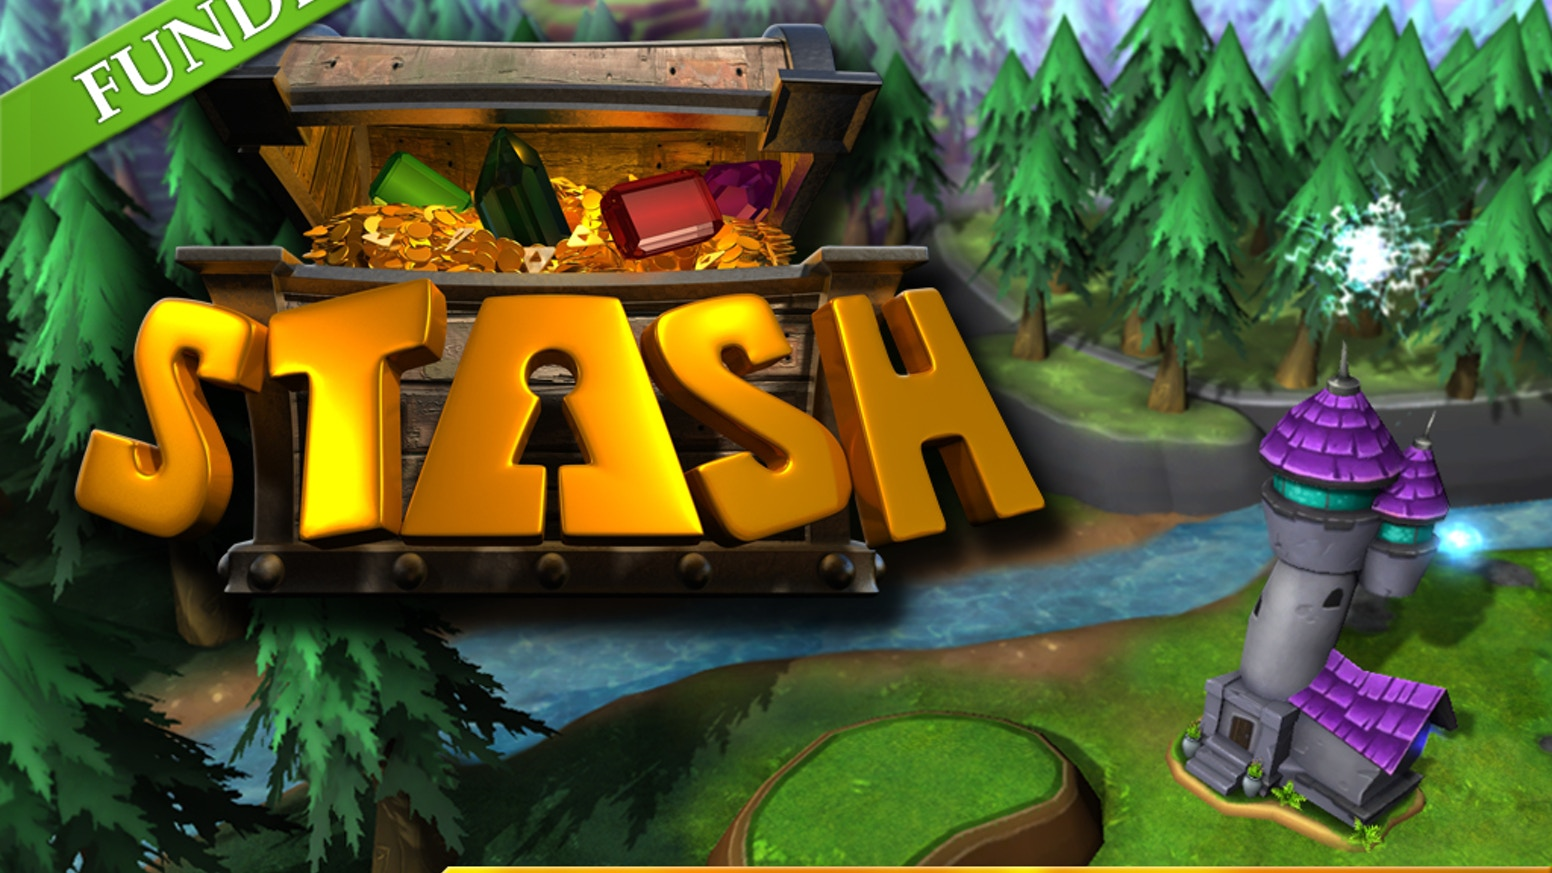 Stash: No Adventurer Left Behind (PC, Mac, Linux) by